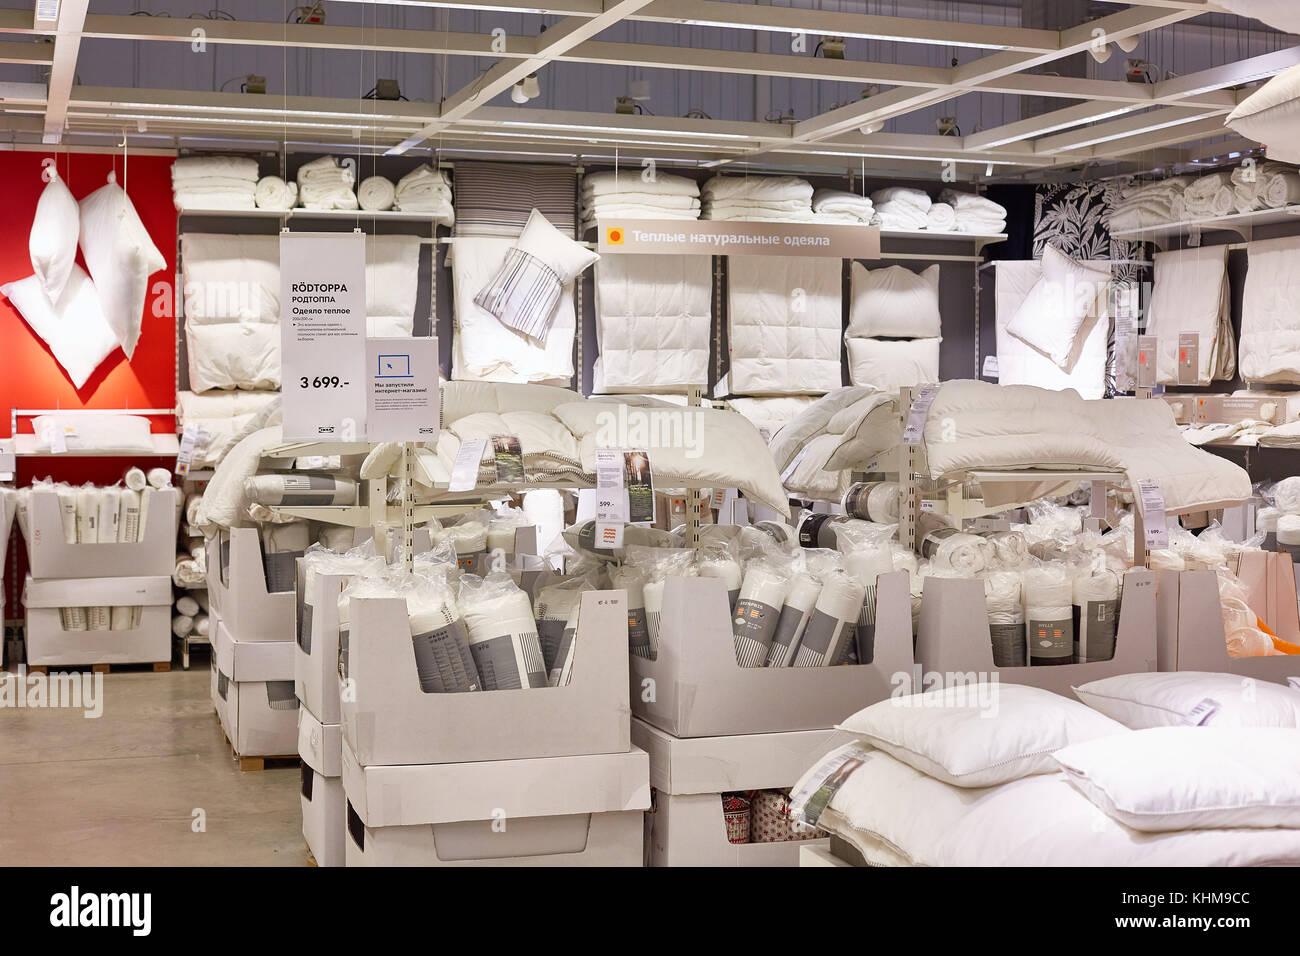 Ikea Cuscino Gosa Vadd.Ikea Pillows Immagini Ikea Pillows Fotos Stock Alamy